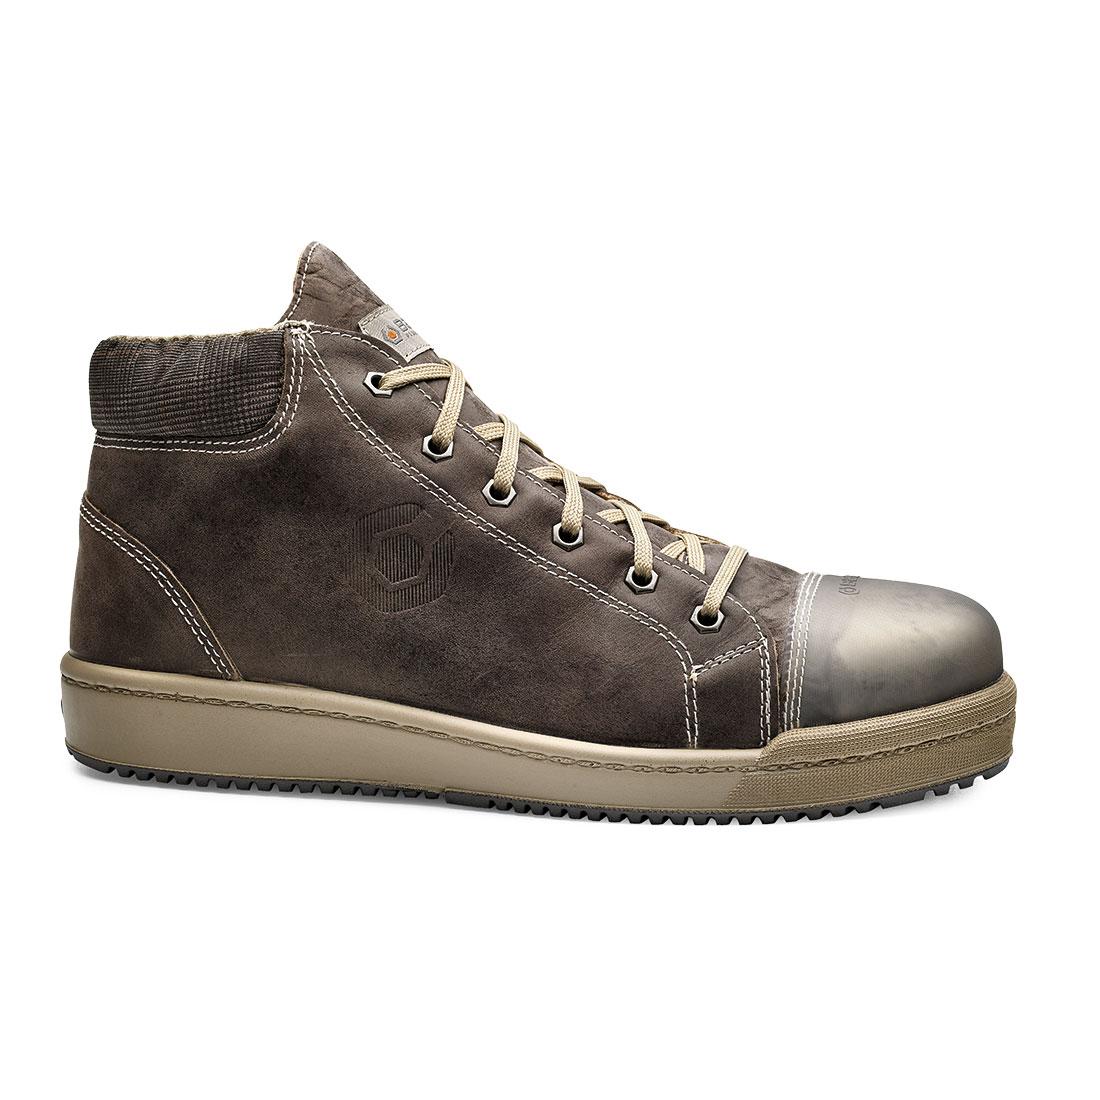 Portwest Oak shoe